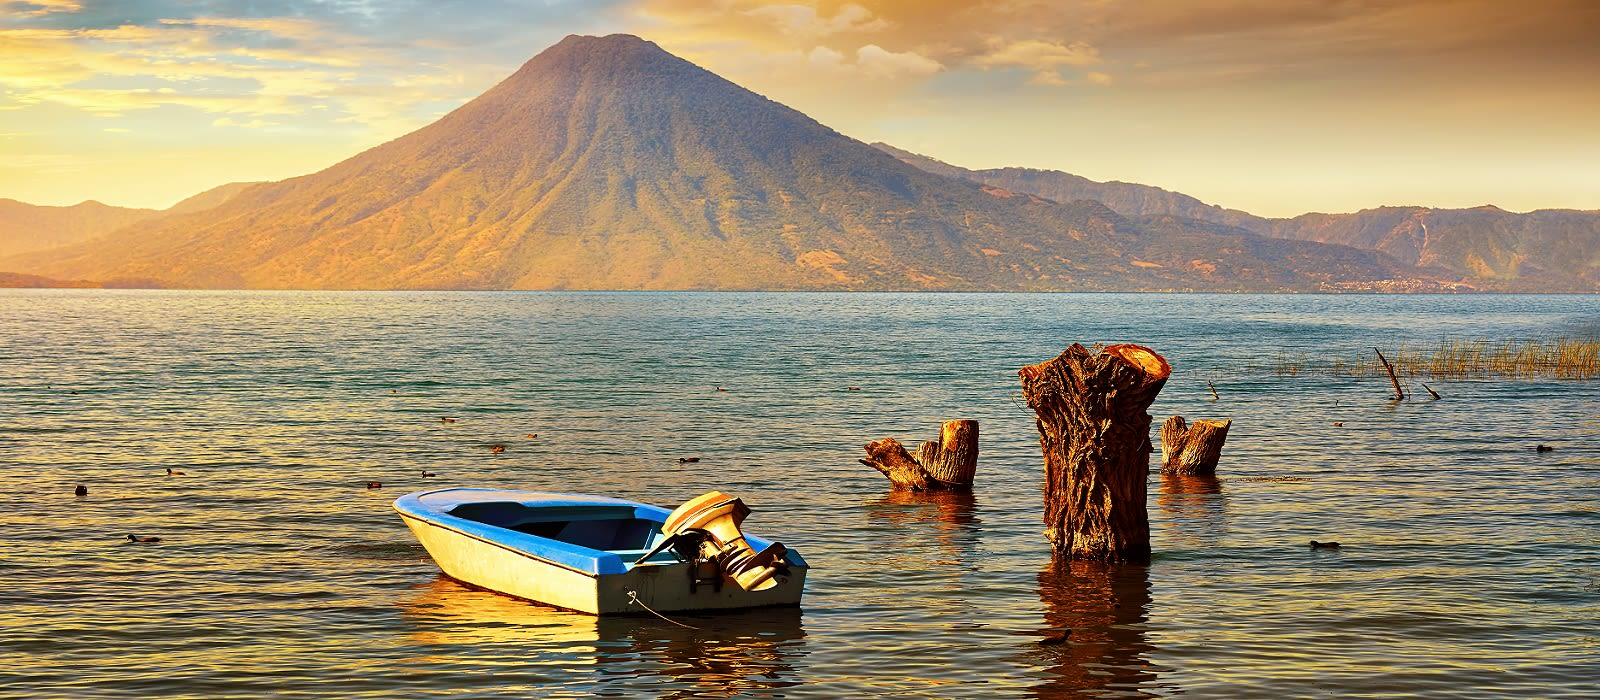 Exotische Vögel & Bezaubernde Landschaften – Vogelbeobachtung in Guatemala Urlaub 3